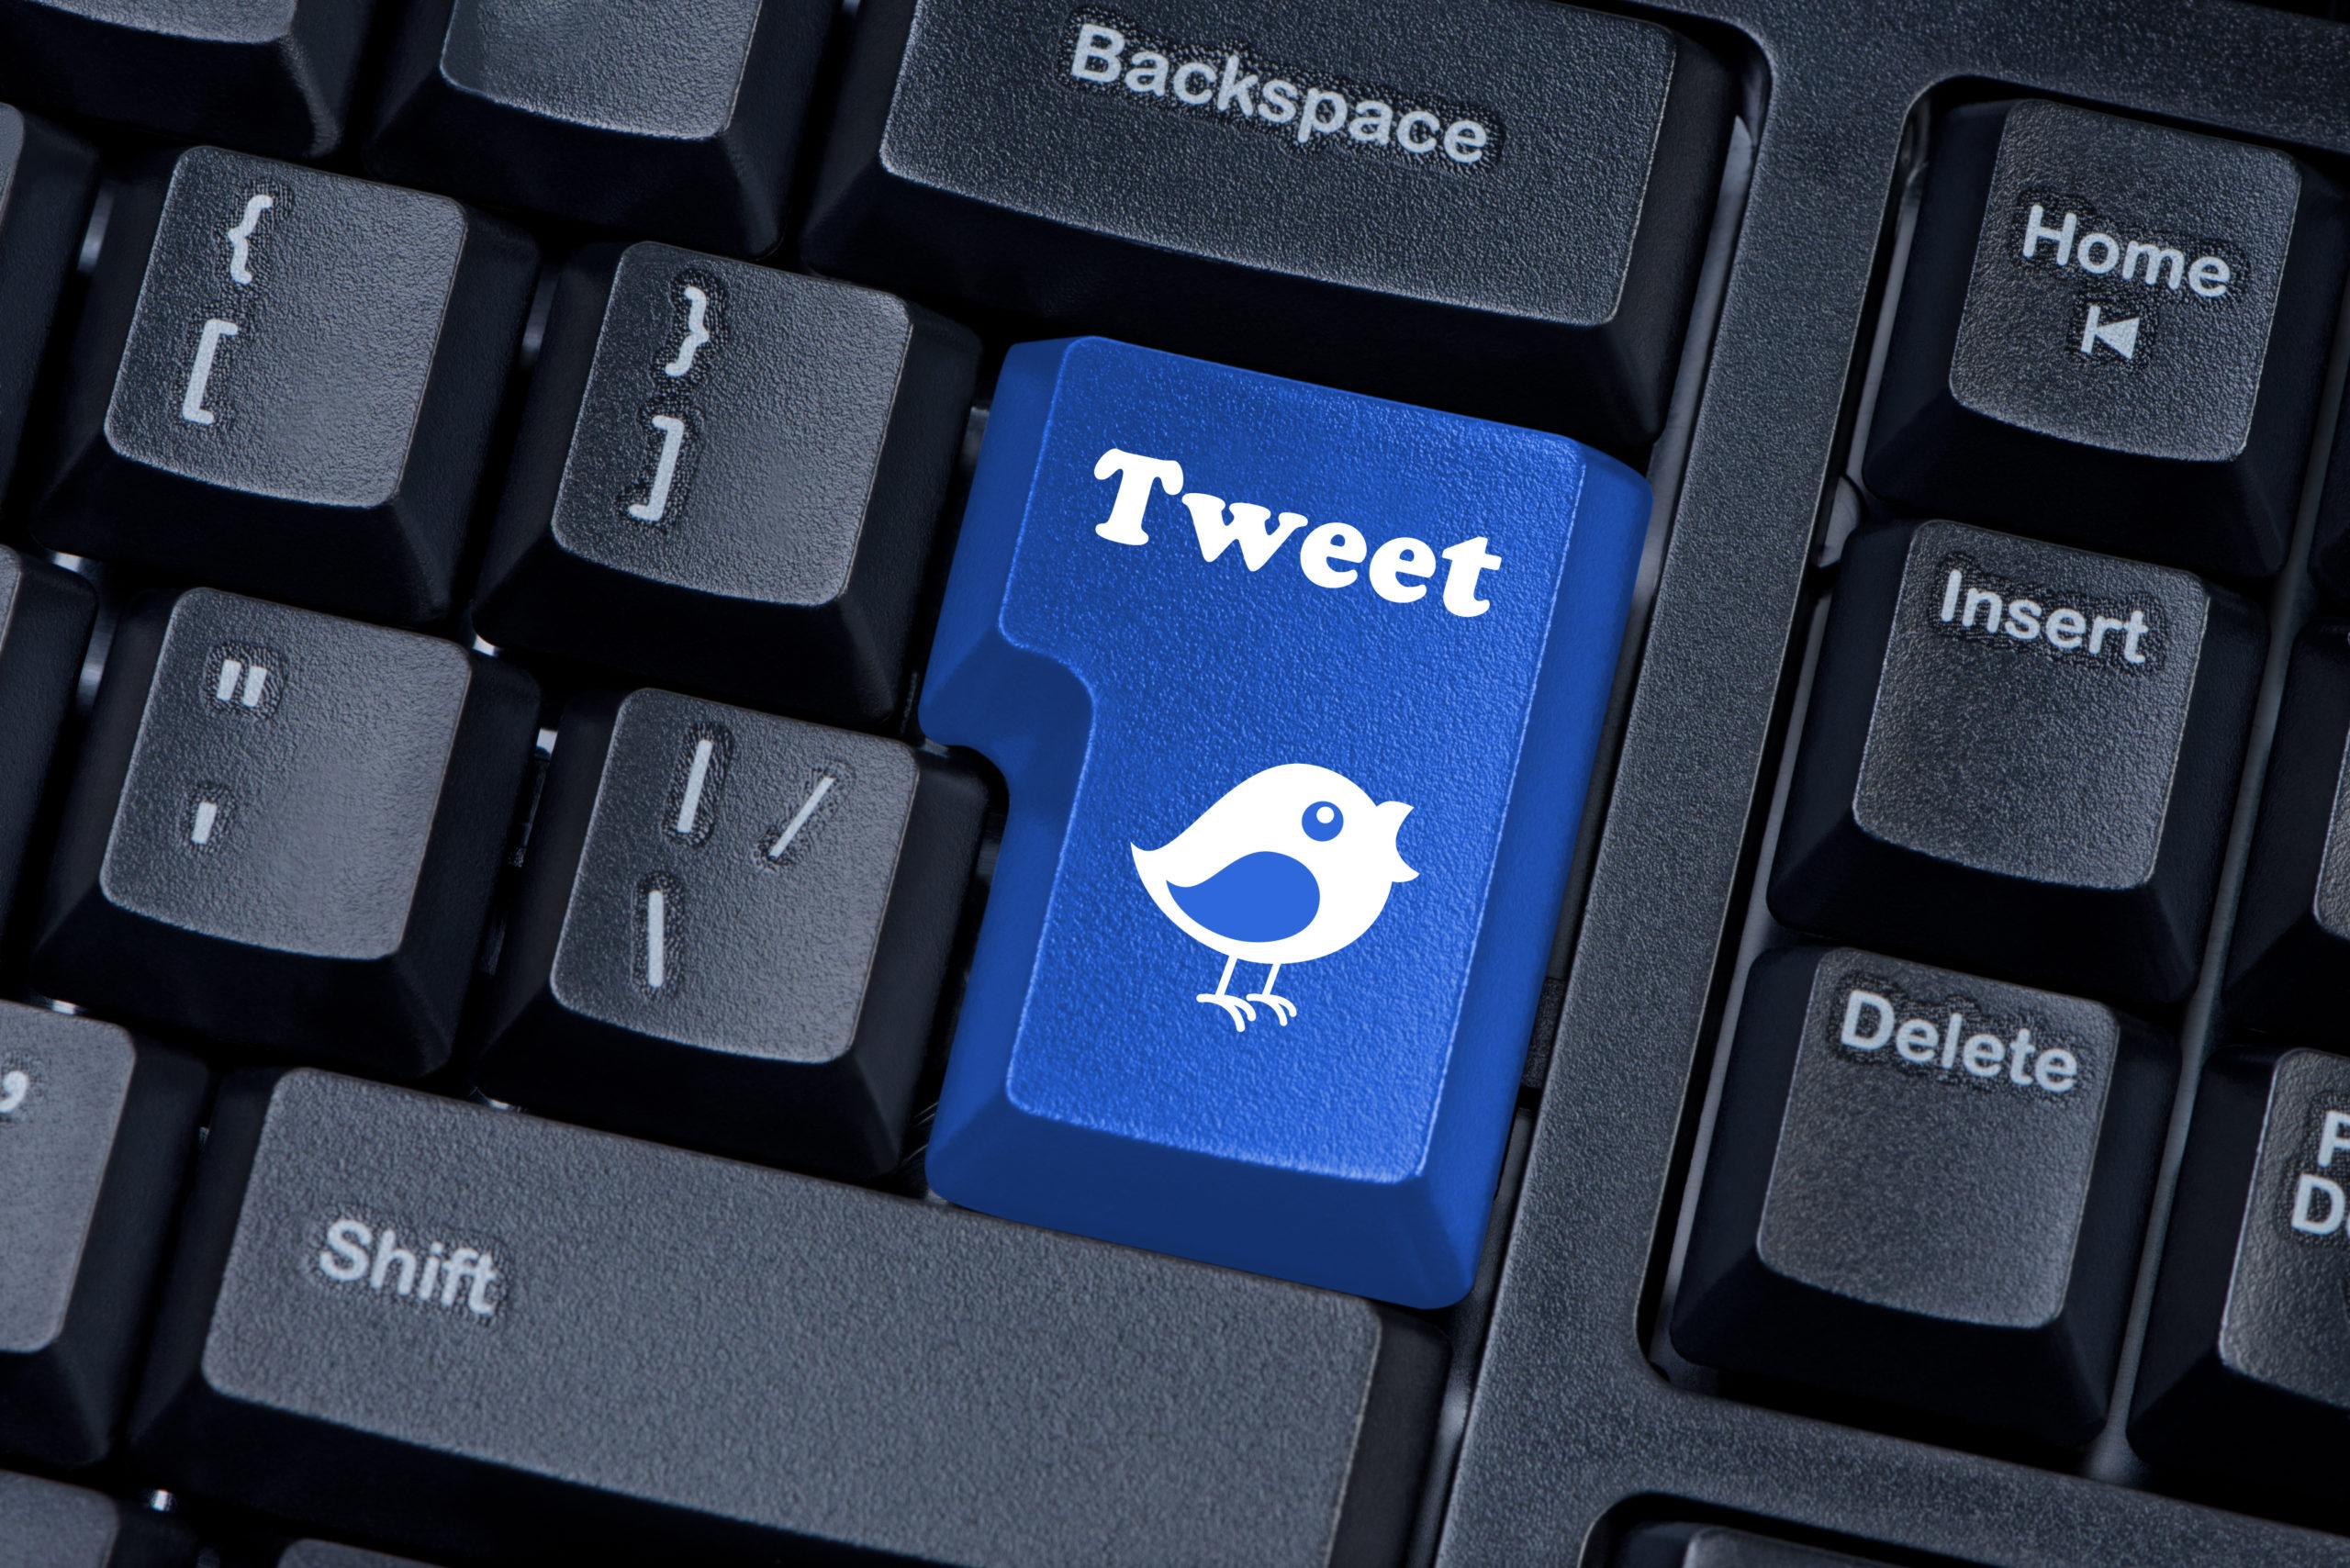 Keypad With Tweet Button